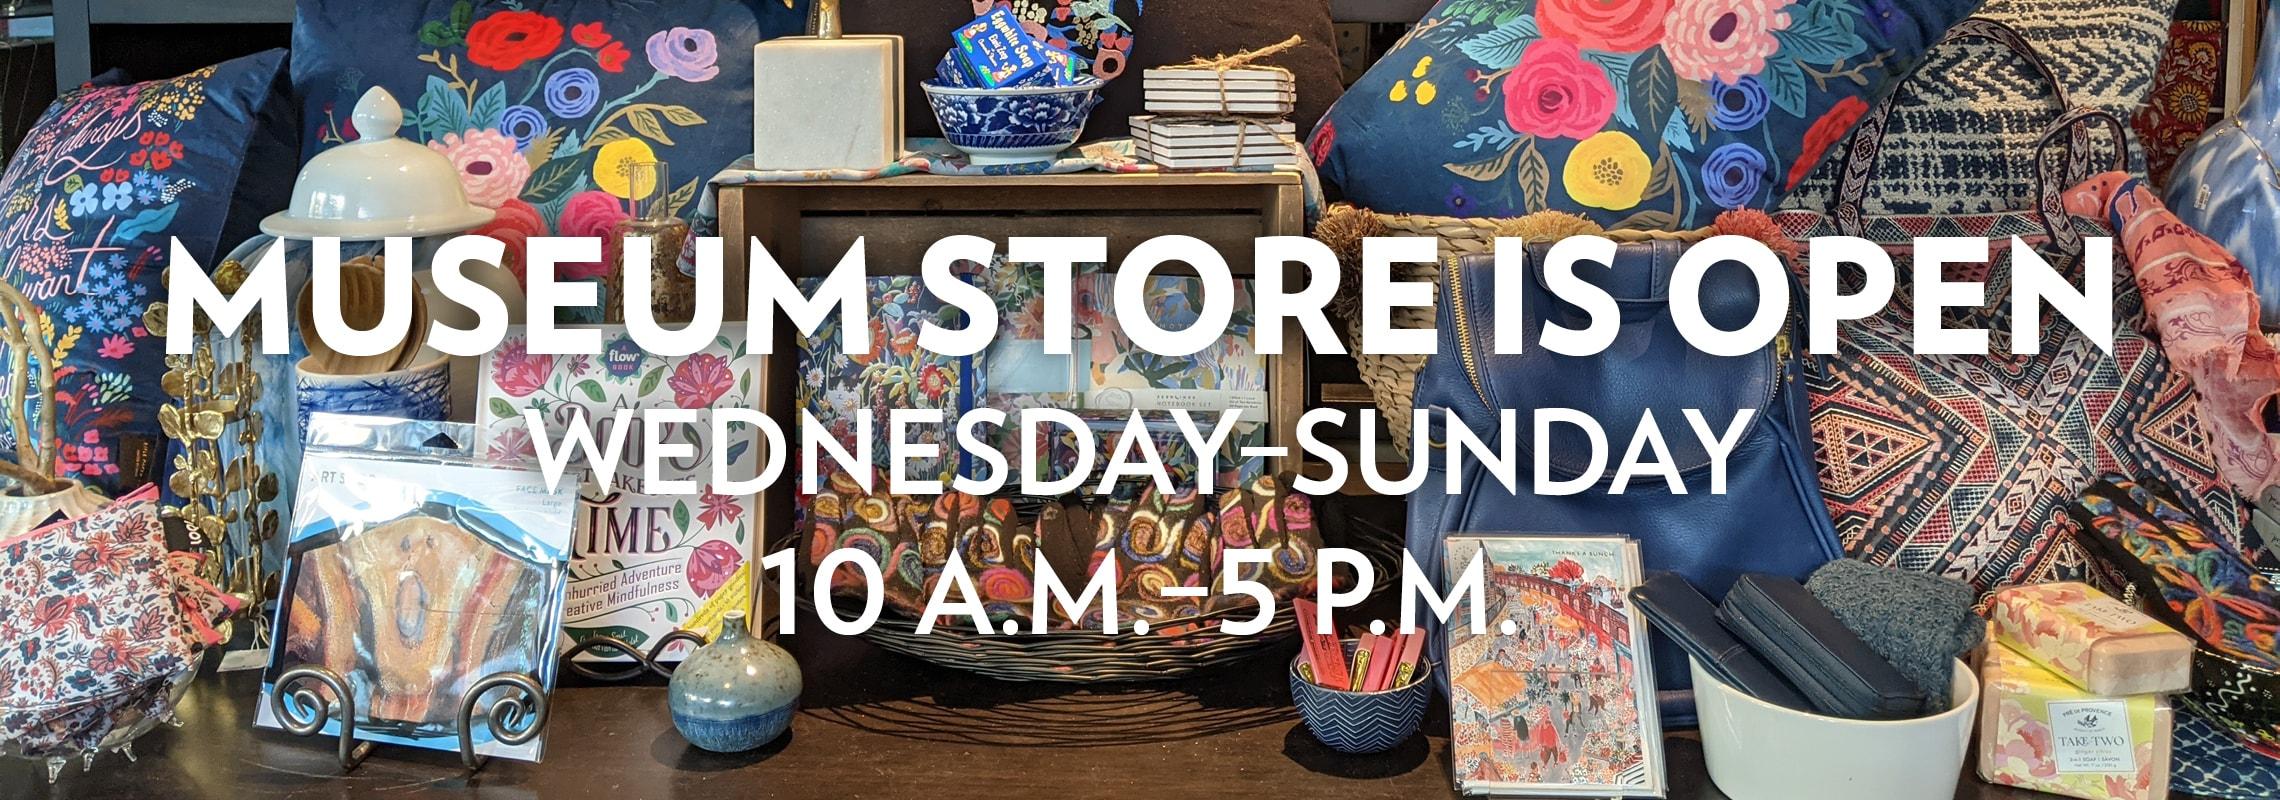 Museum Store is Open